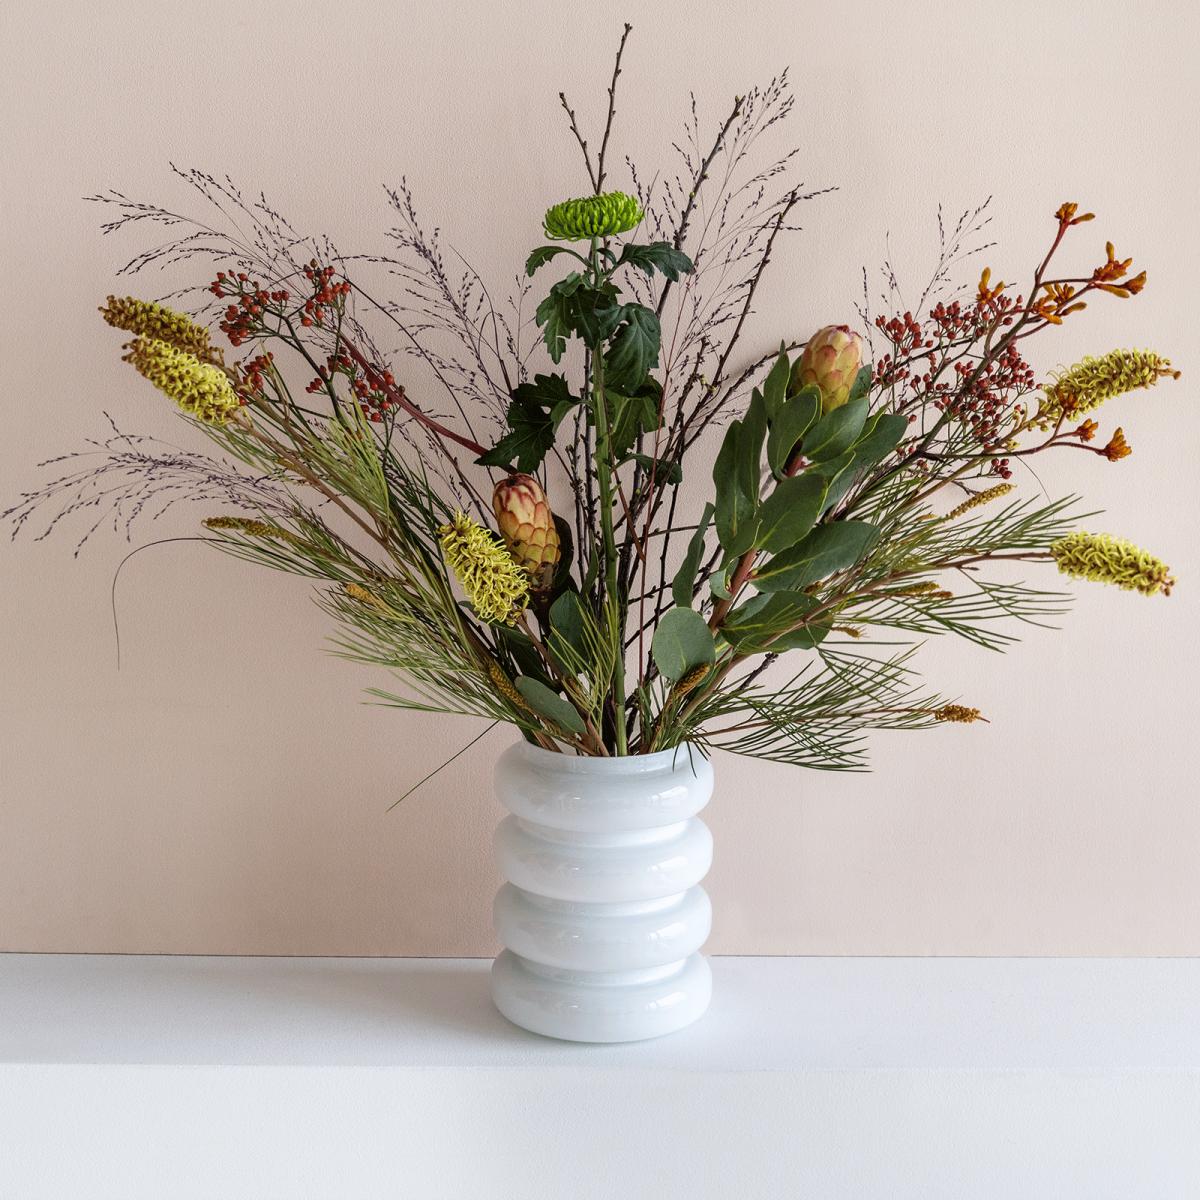 Vase en verre recyclé blanc opaque * Urban Nature Culture